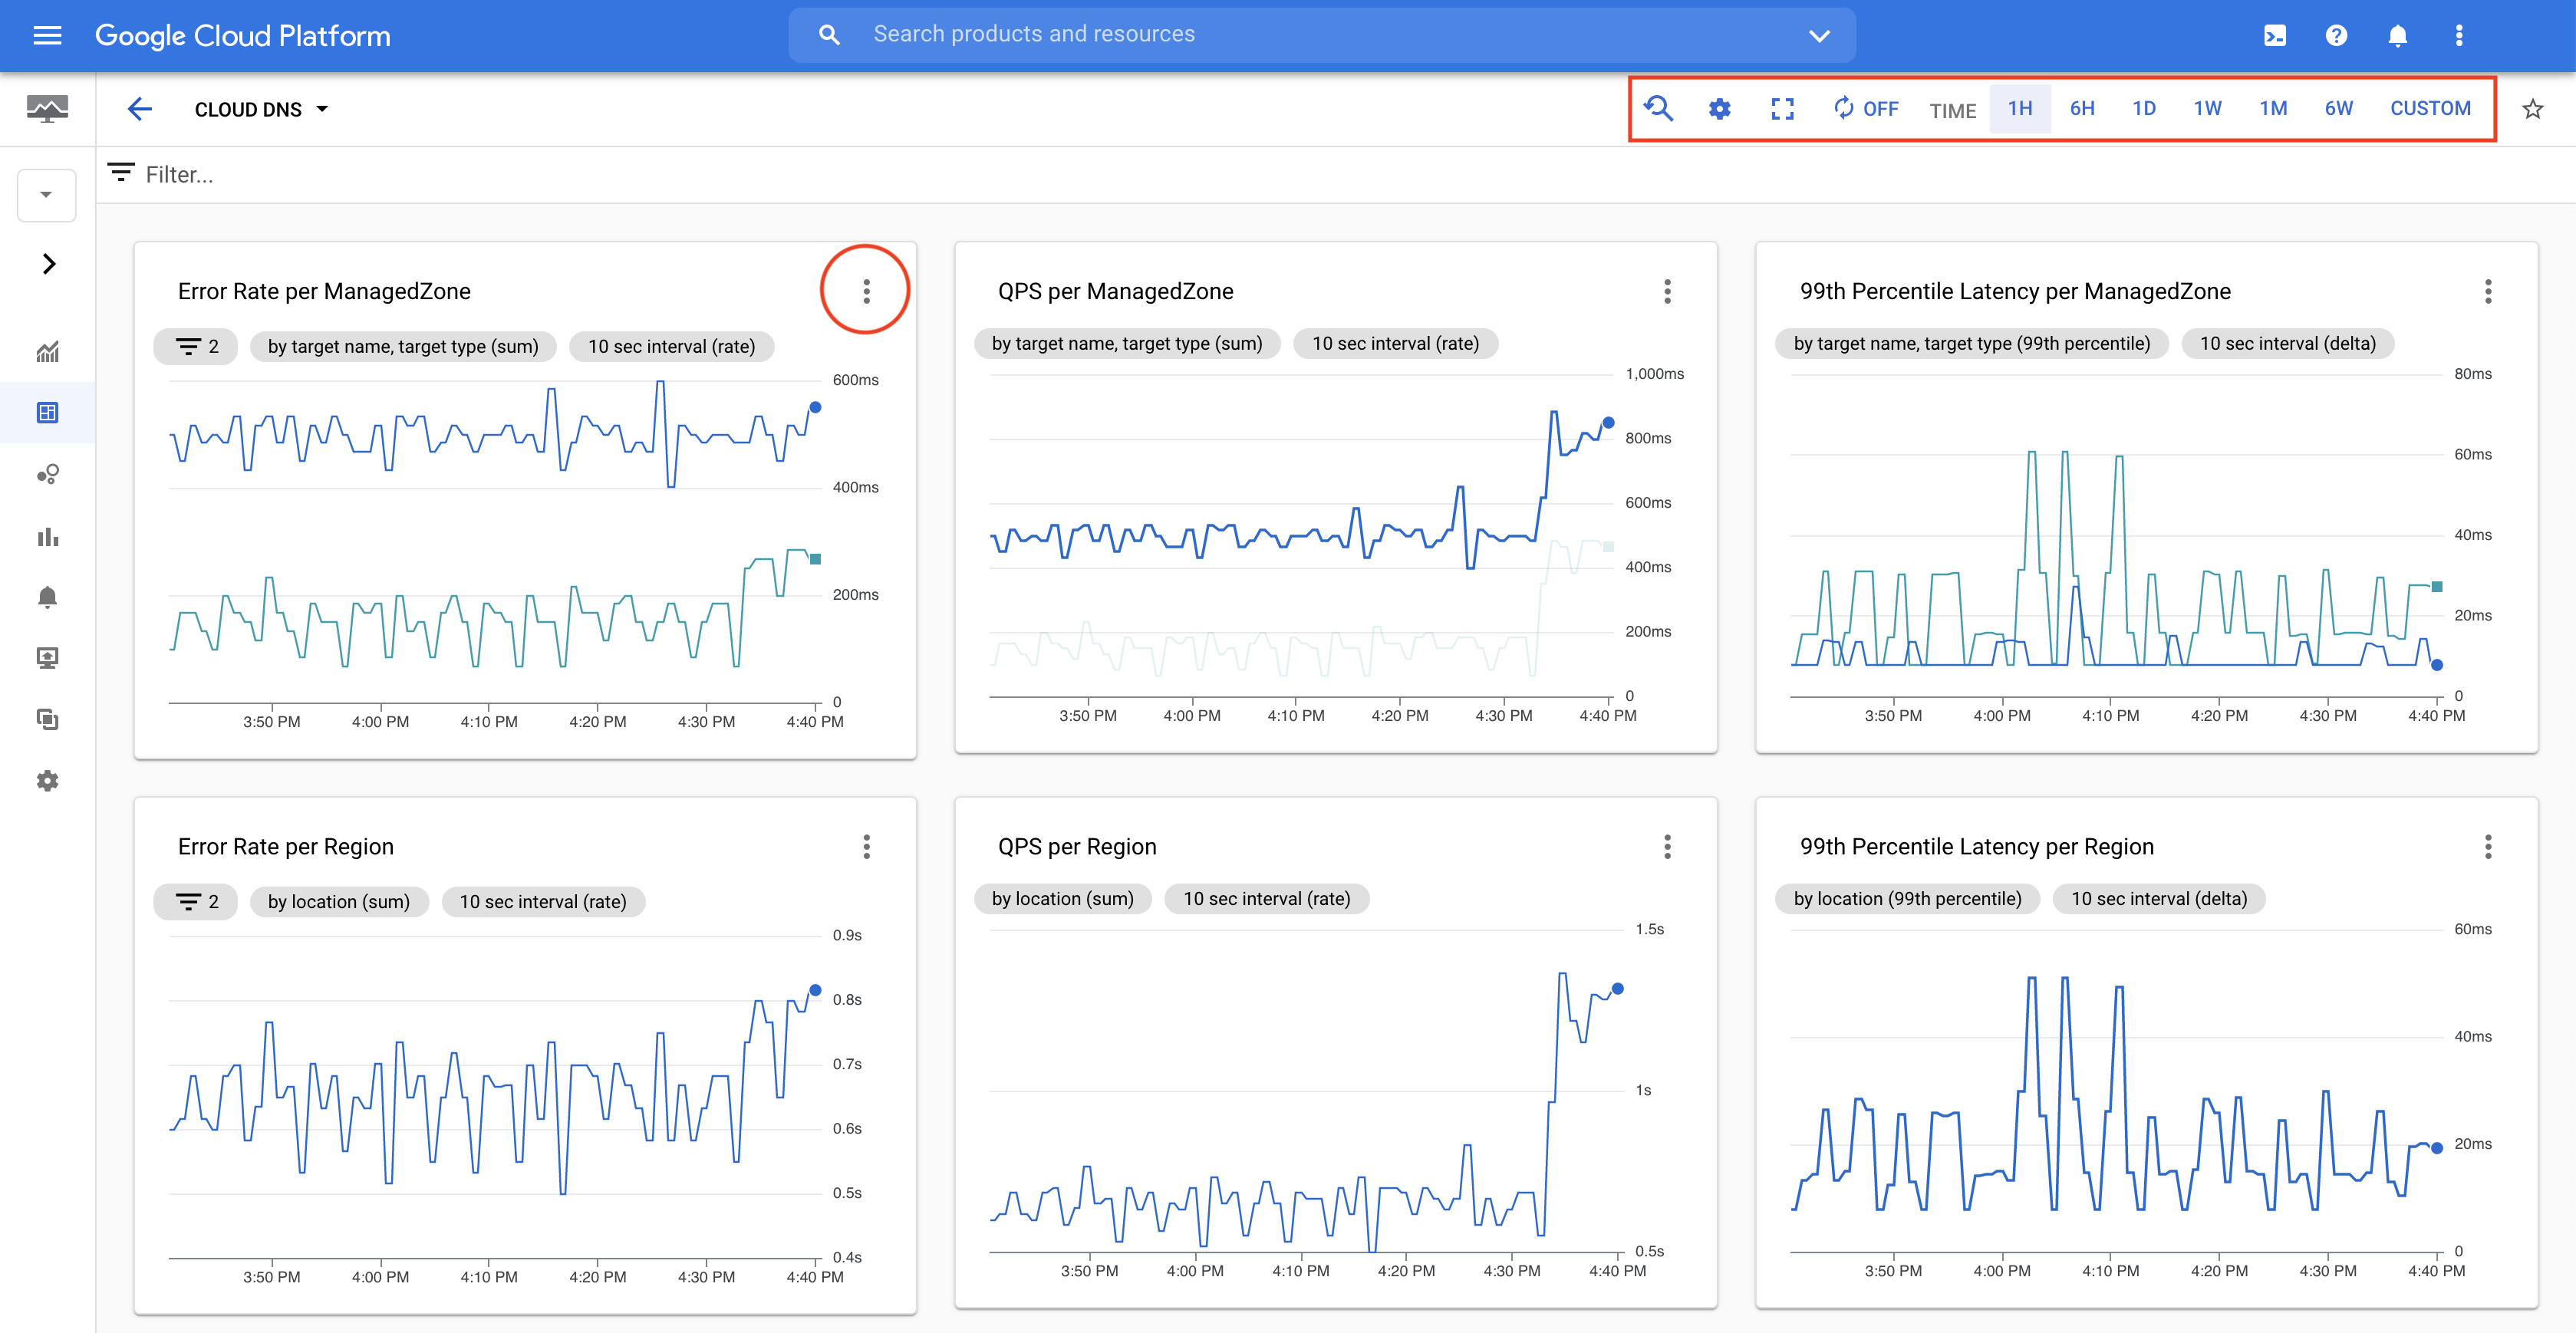 Monitoring-Seite der Google Cloud Console.